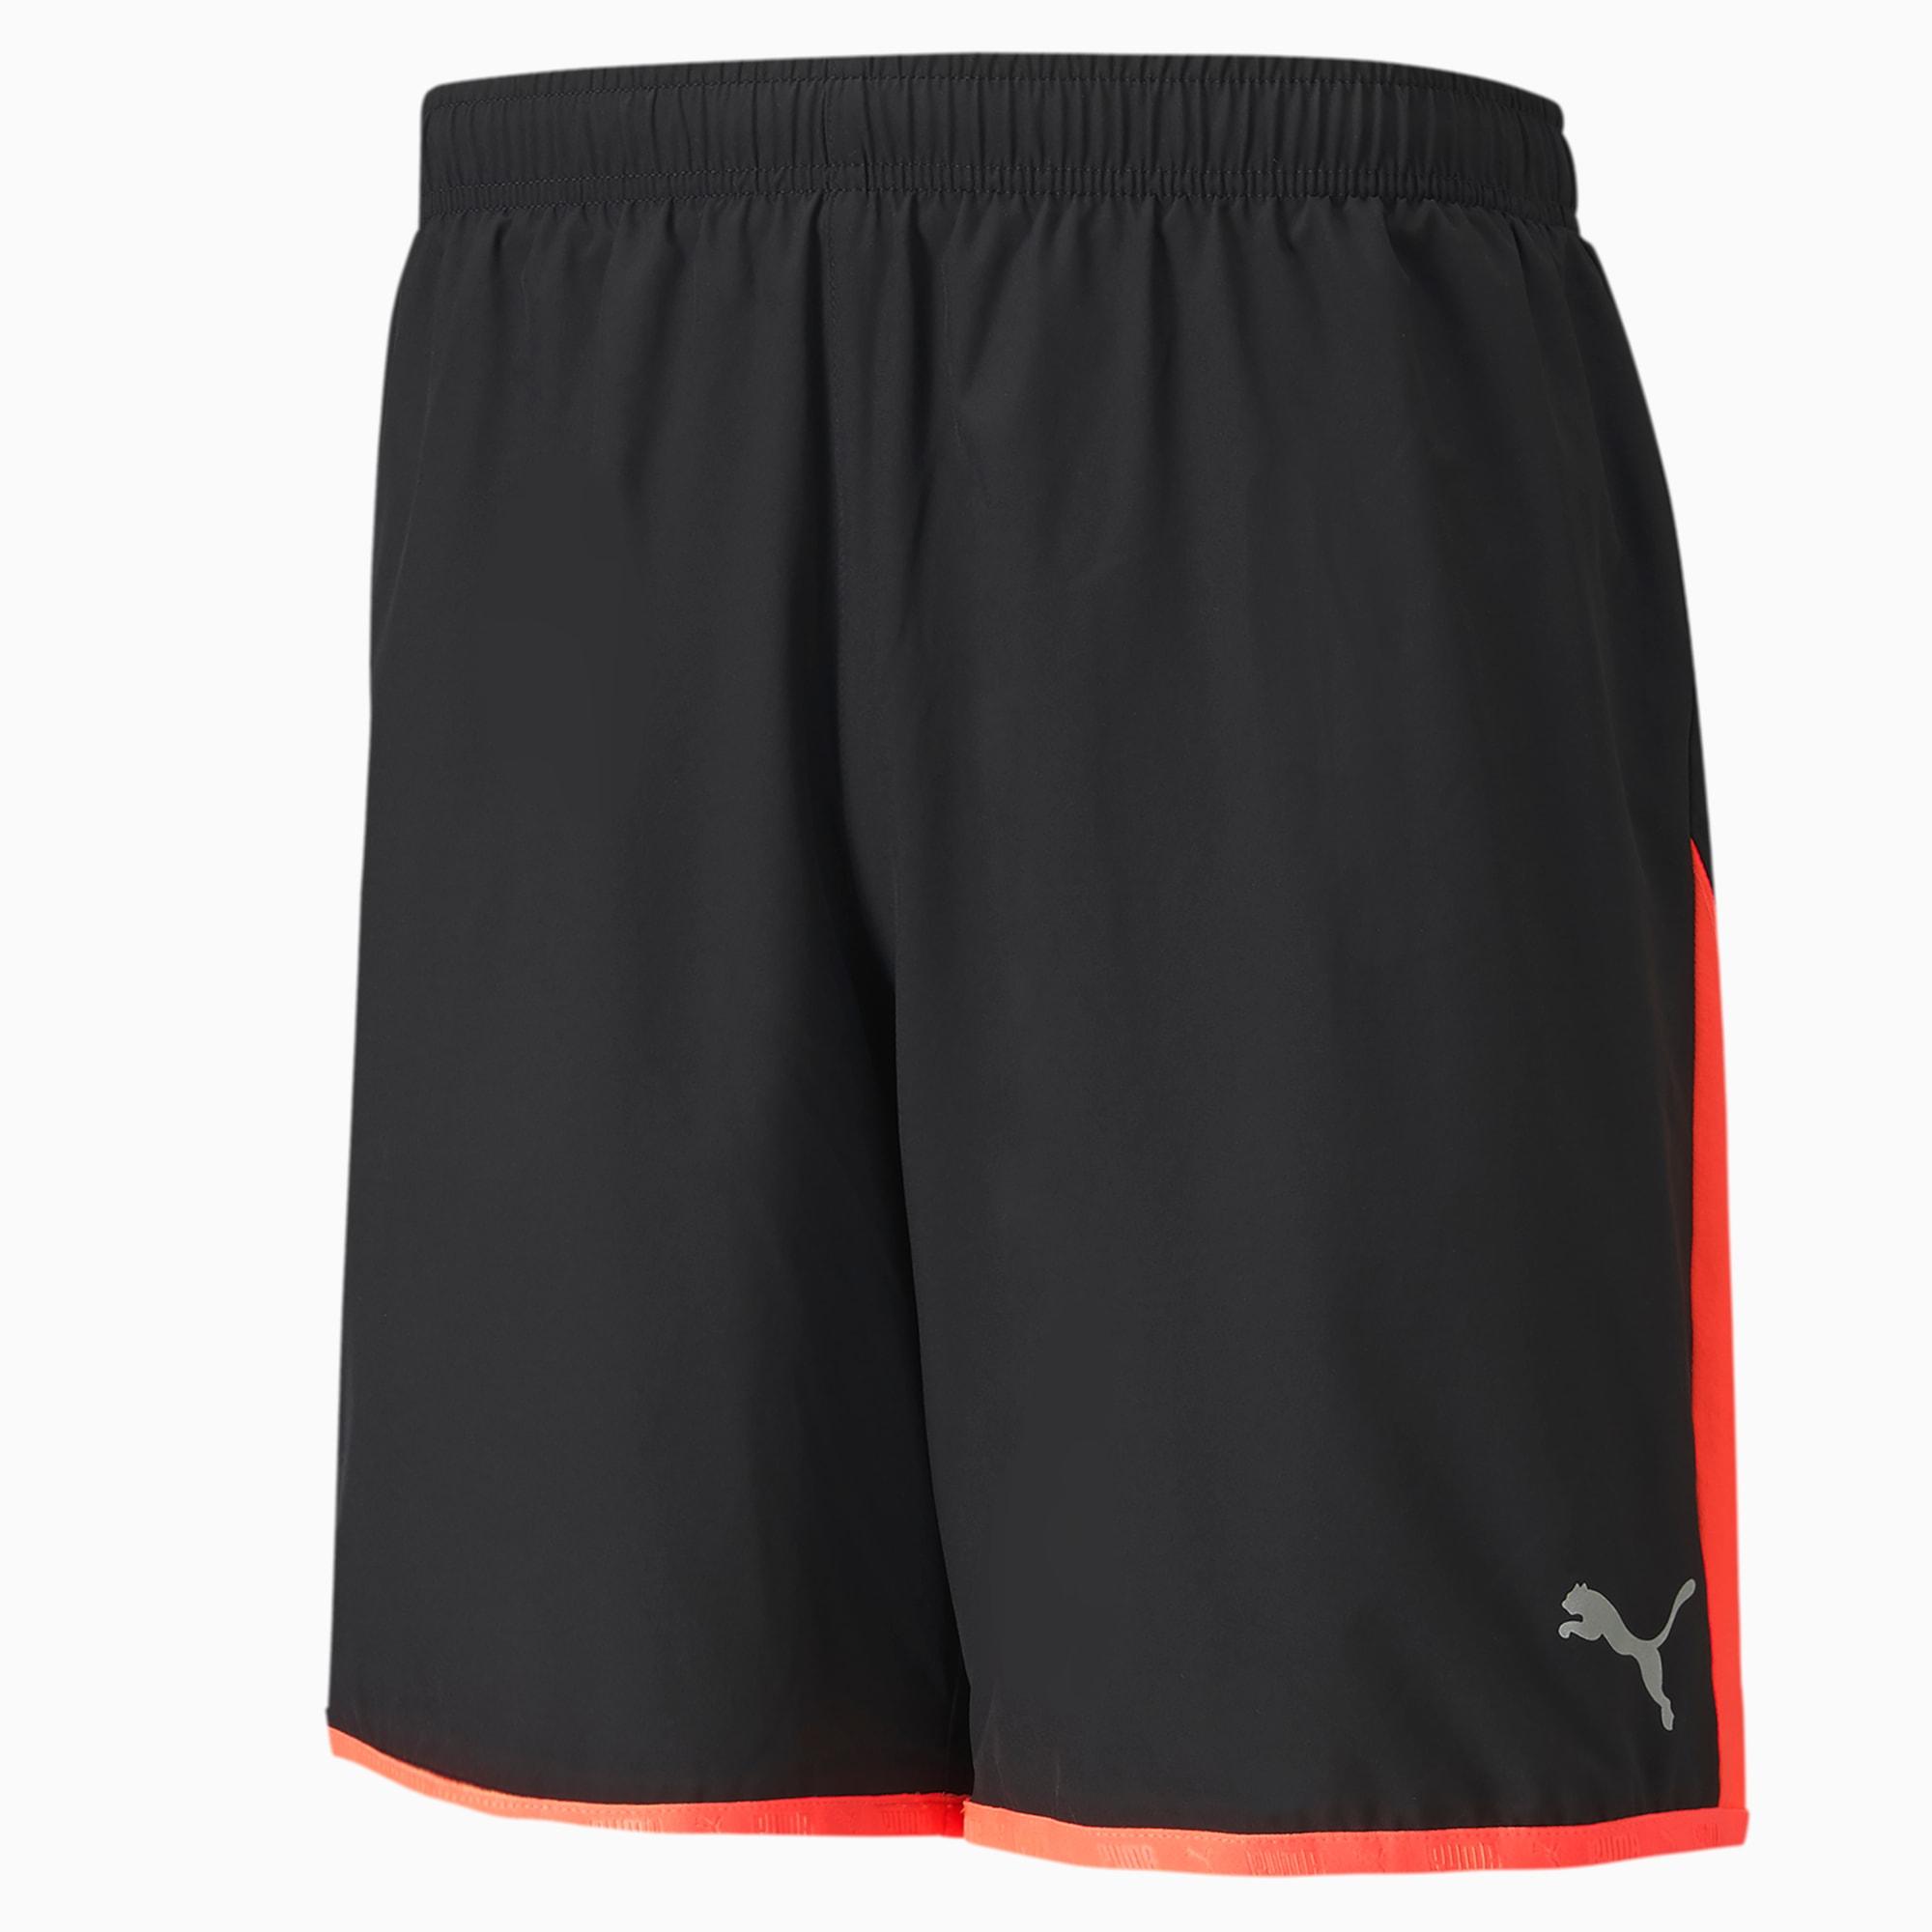 Last Lap Men's Colorblock Shorts, Puma Black-Ignite Pink, extralarge